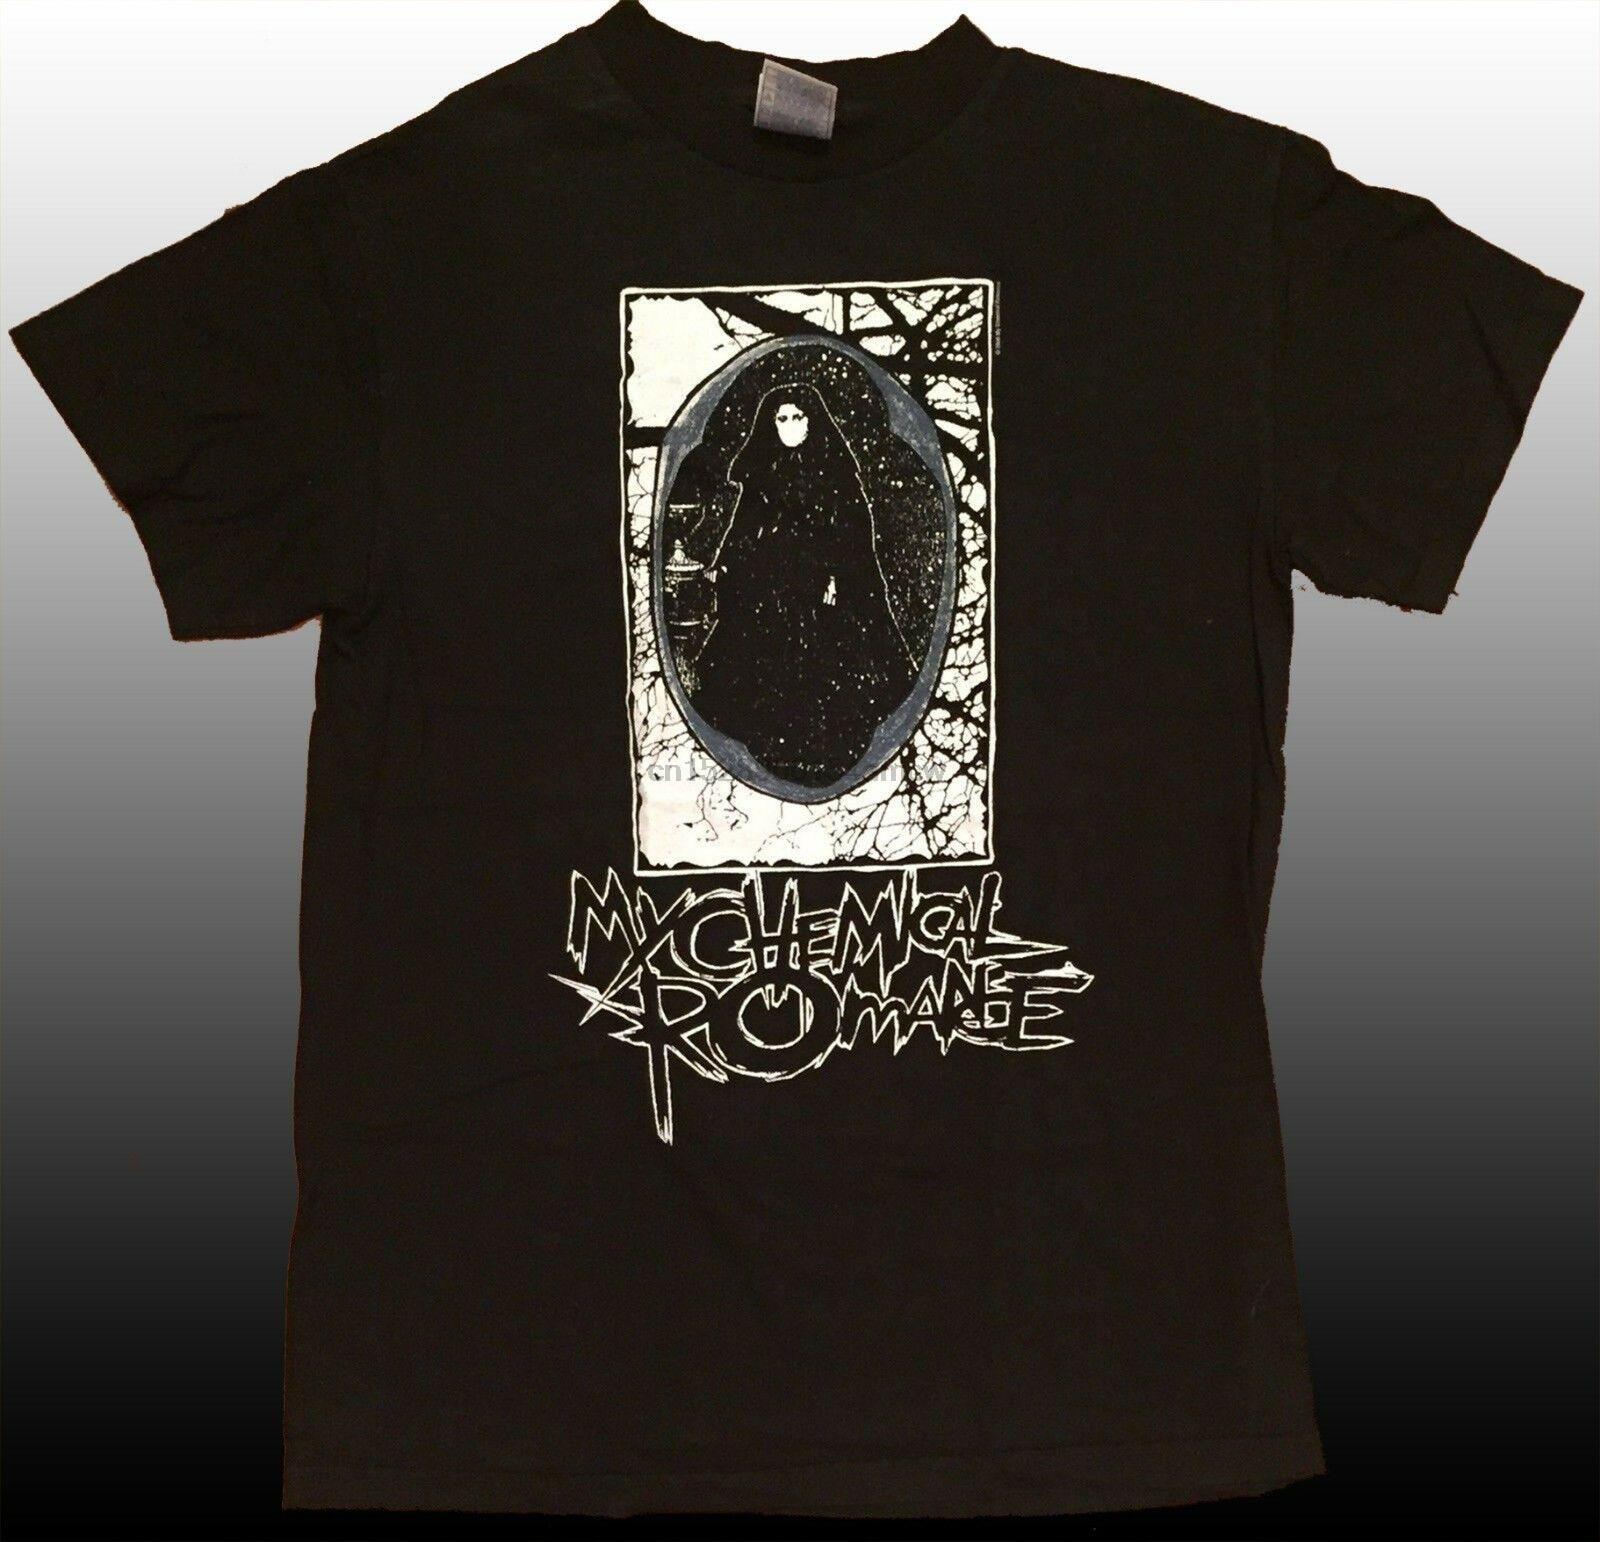 Vintage Rare MCR My Chemical Romance 2006 Emo Helena T Shirt Size S-2XL Reprint